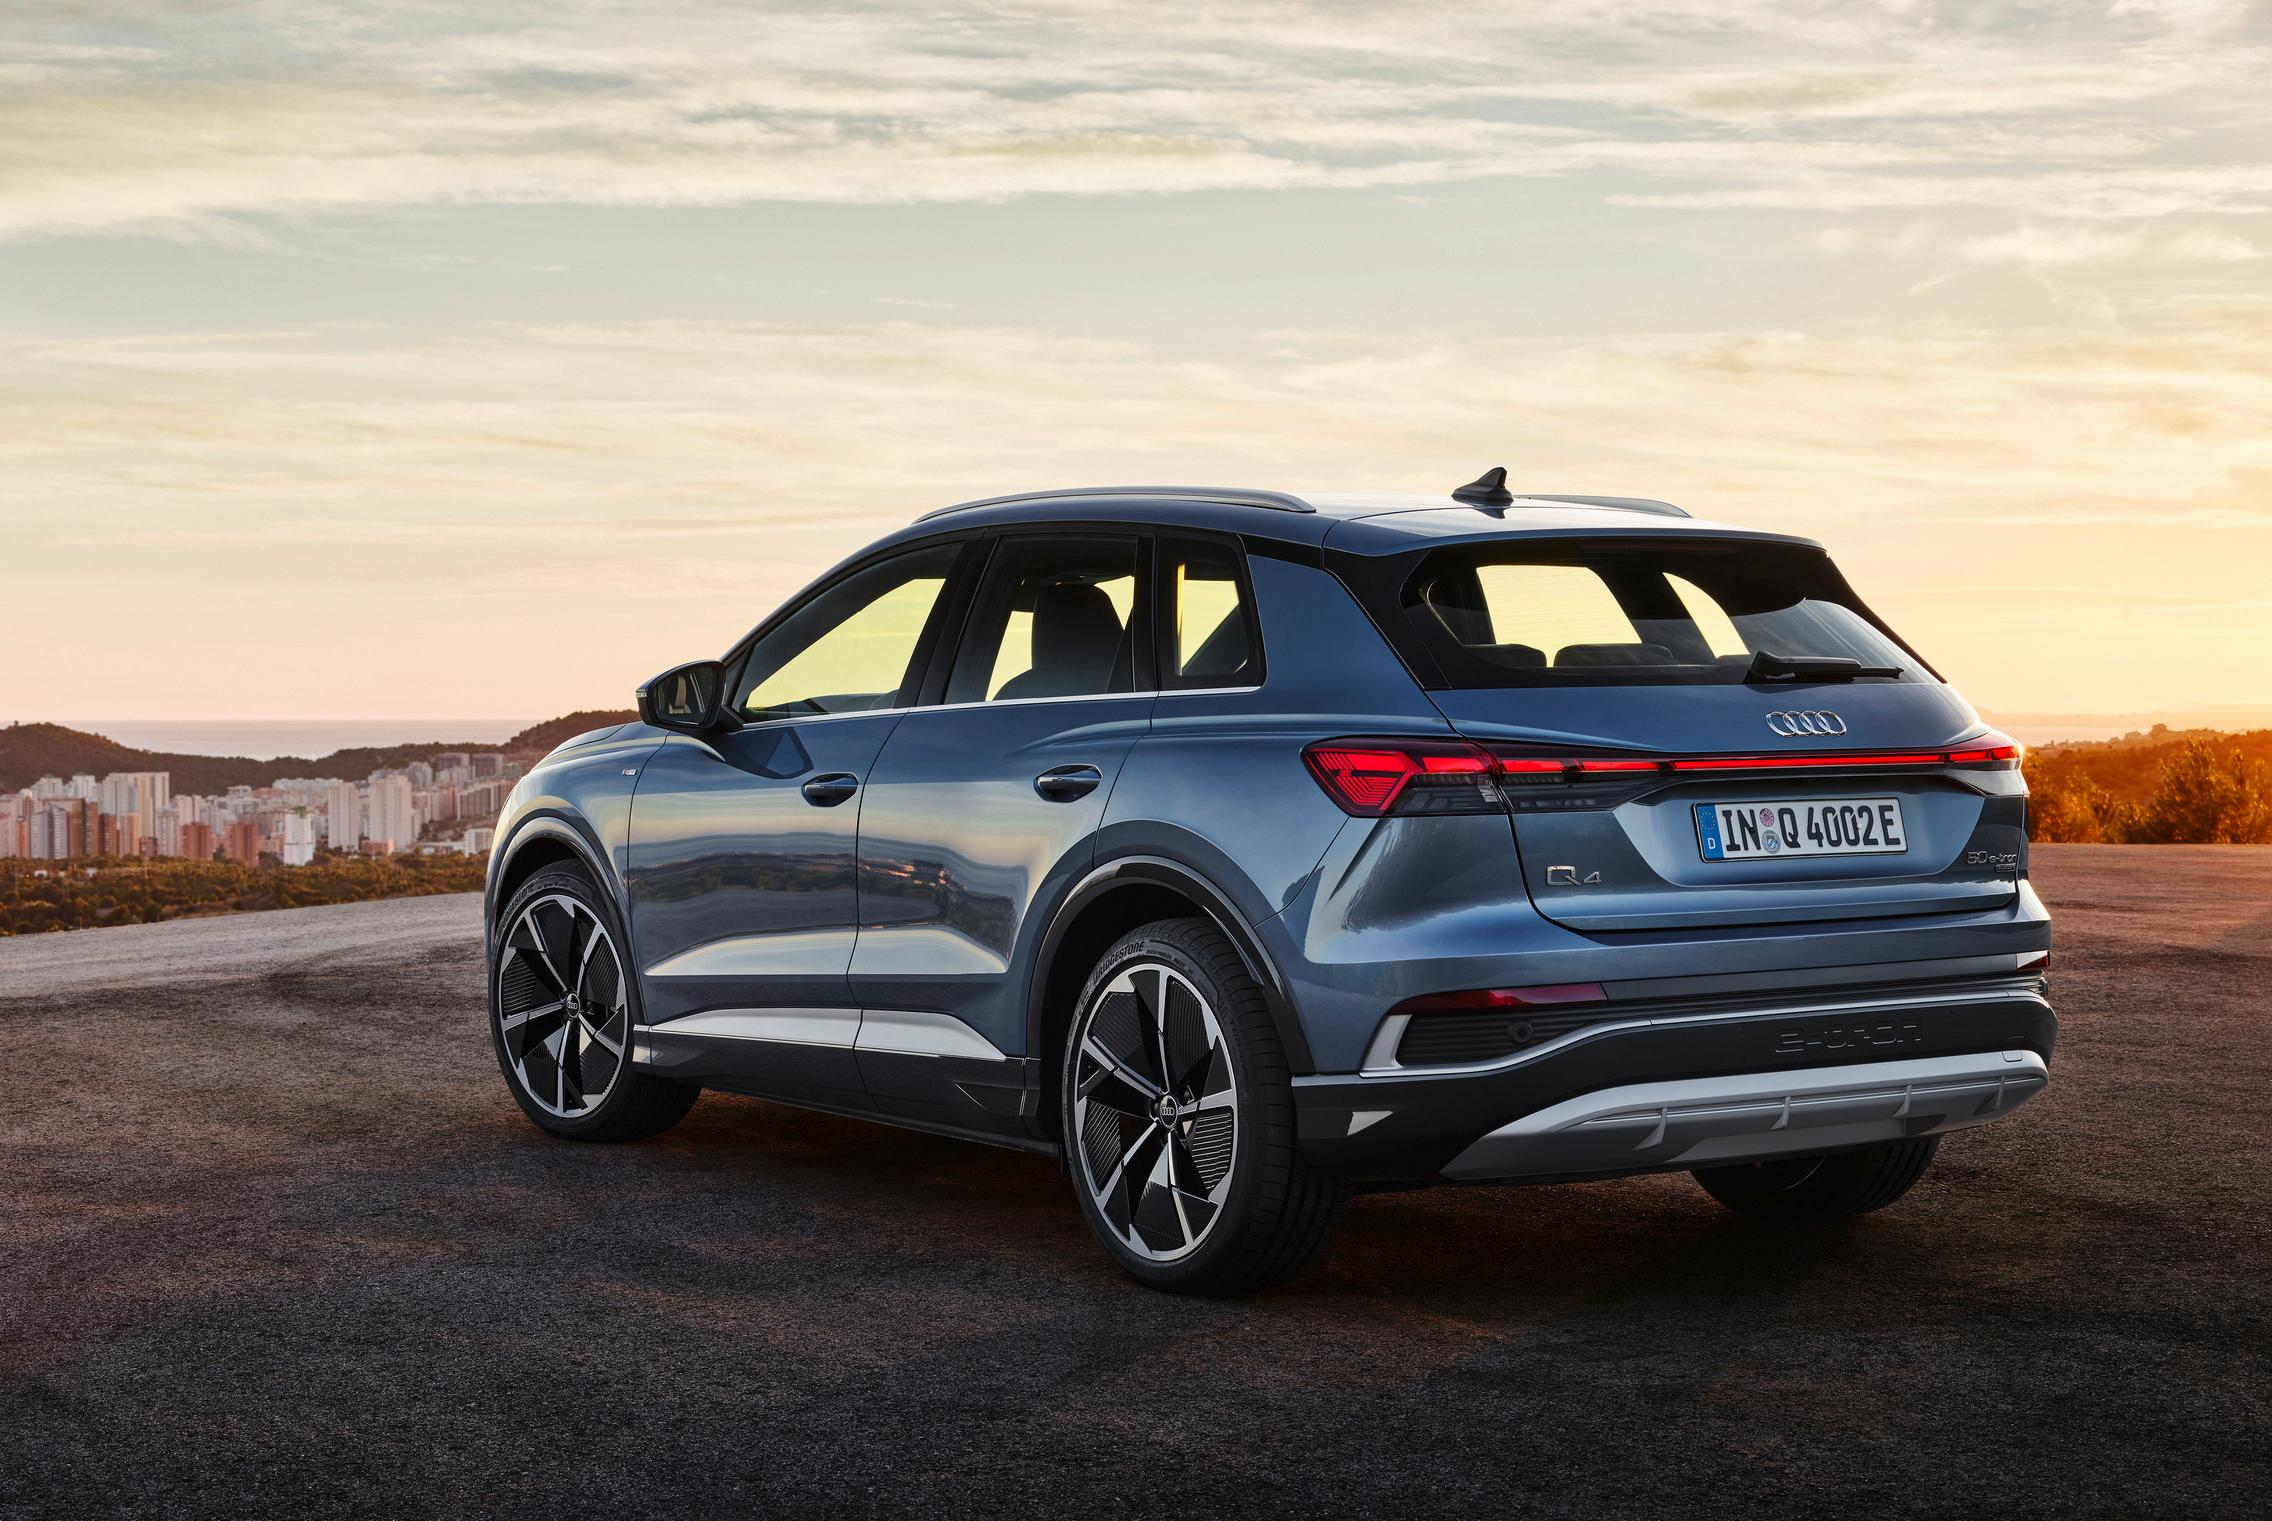 Audi Q4 50 e-tron price